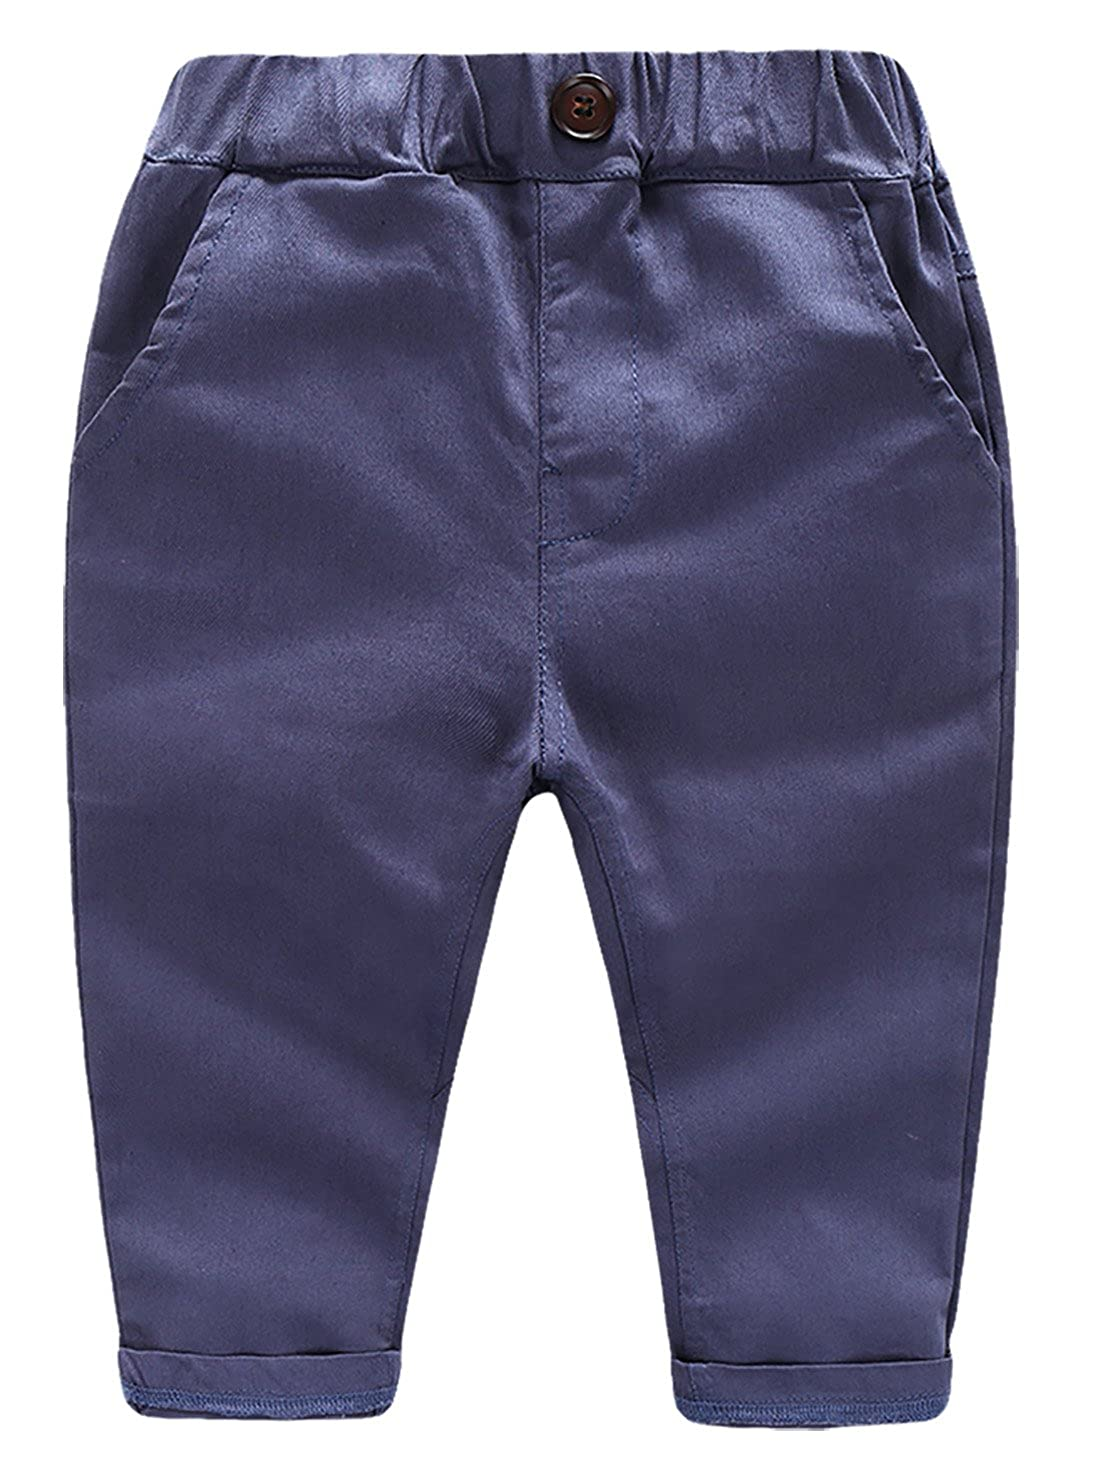 BALETONGNIAN Baby Boys Chino Pants Toddler Kids Pants Cotton Joggers Pull On Pants 2Y 6Y